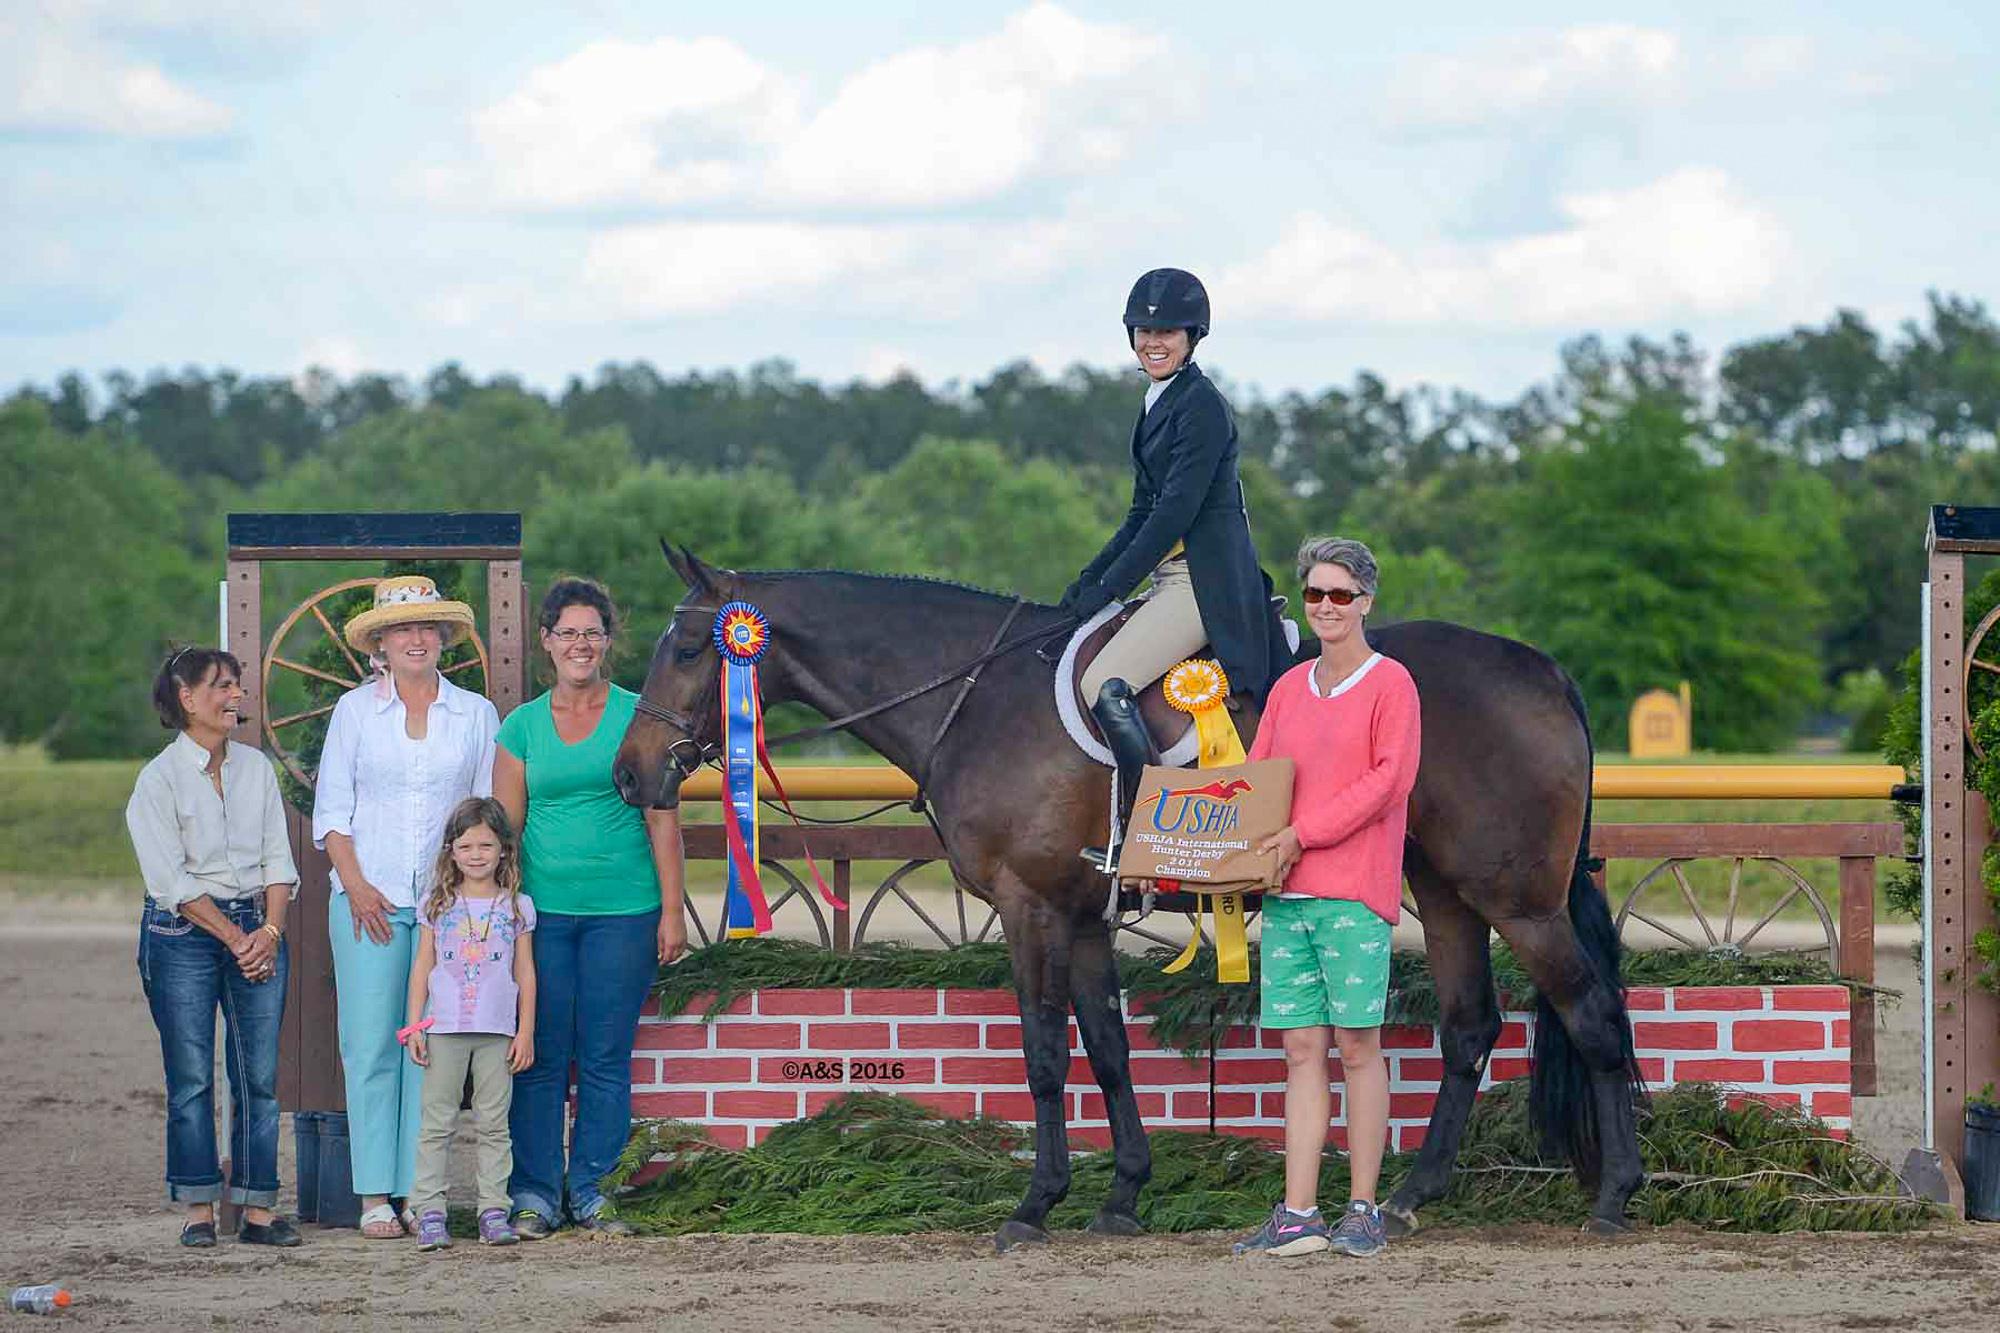 Liza Boyd celebrated her birthday with the $15,000 USHJA International Hunter Derby victory aboard Pony Lane Farm's Like I Said (A&S Photography)